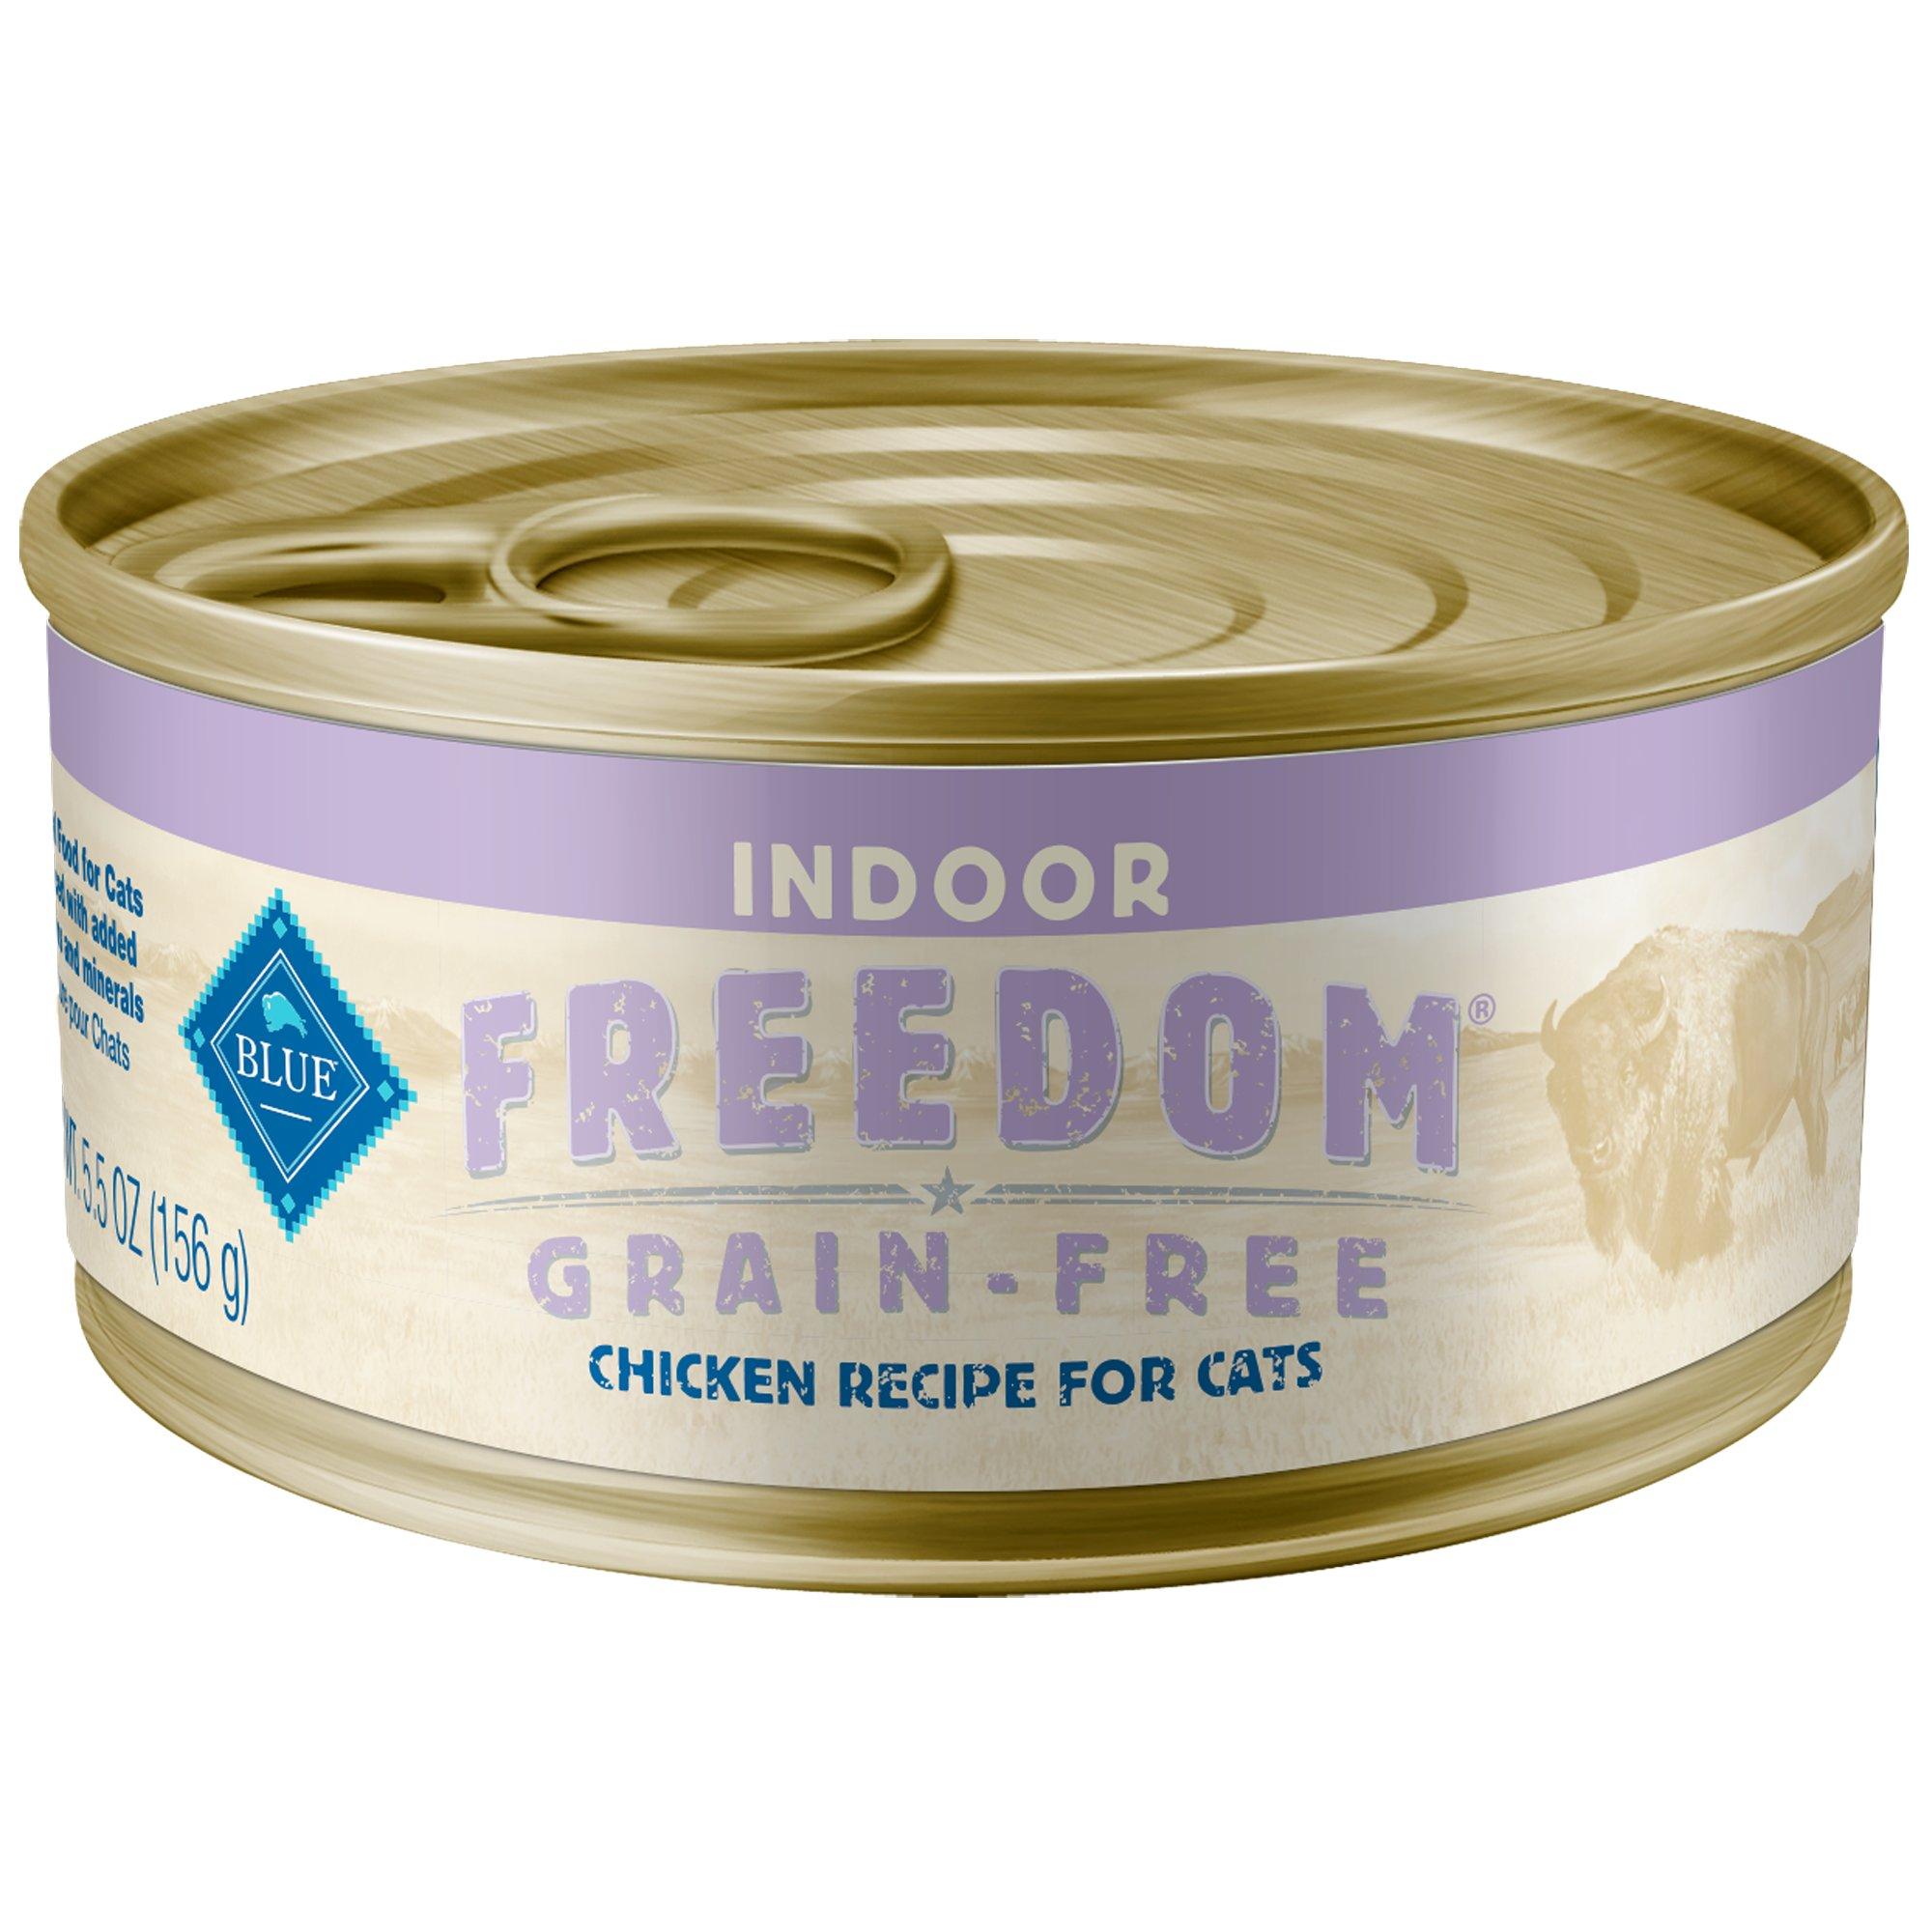 Blue buffalo blue freedom grain free indoor chicken recipe